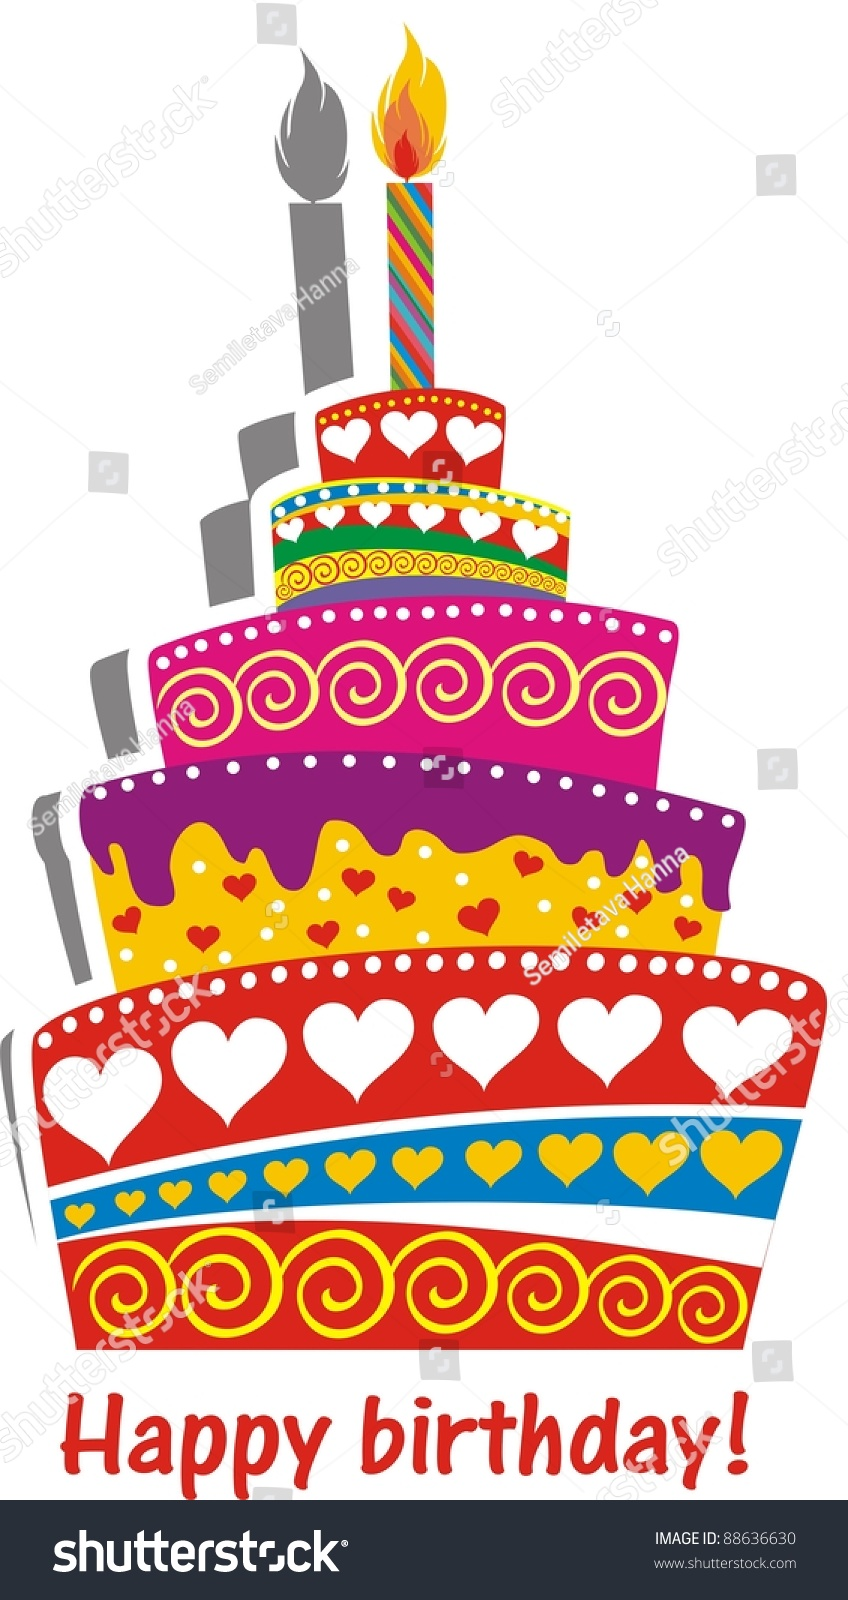 Birthday Cake With Less Cream